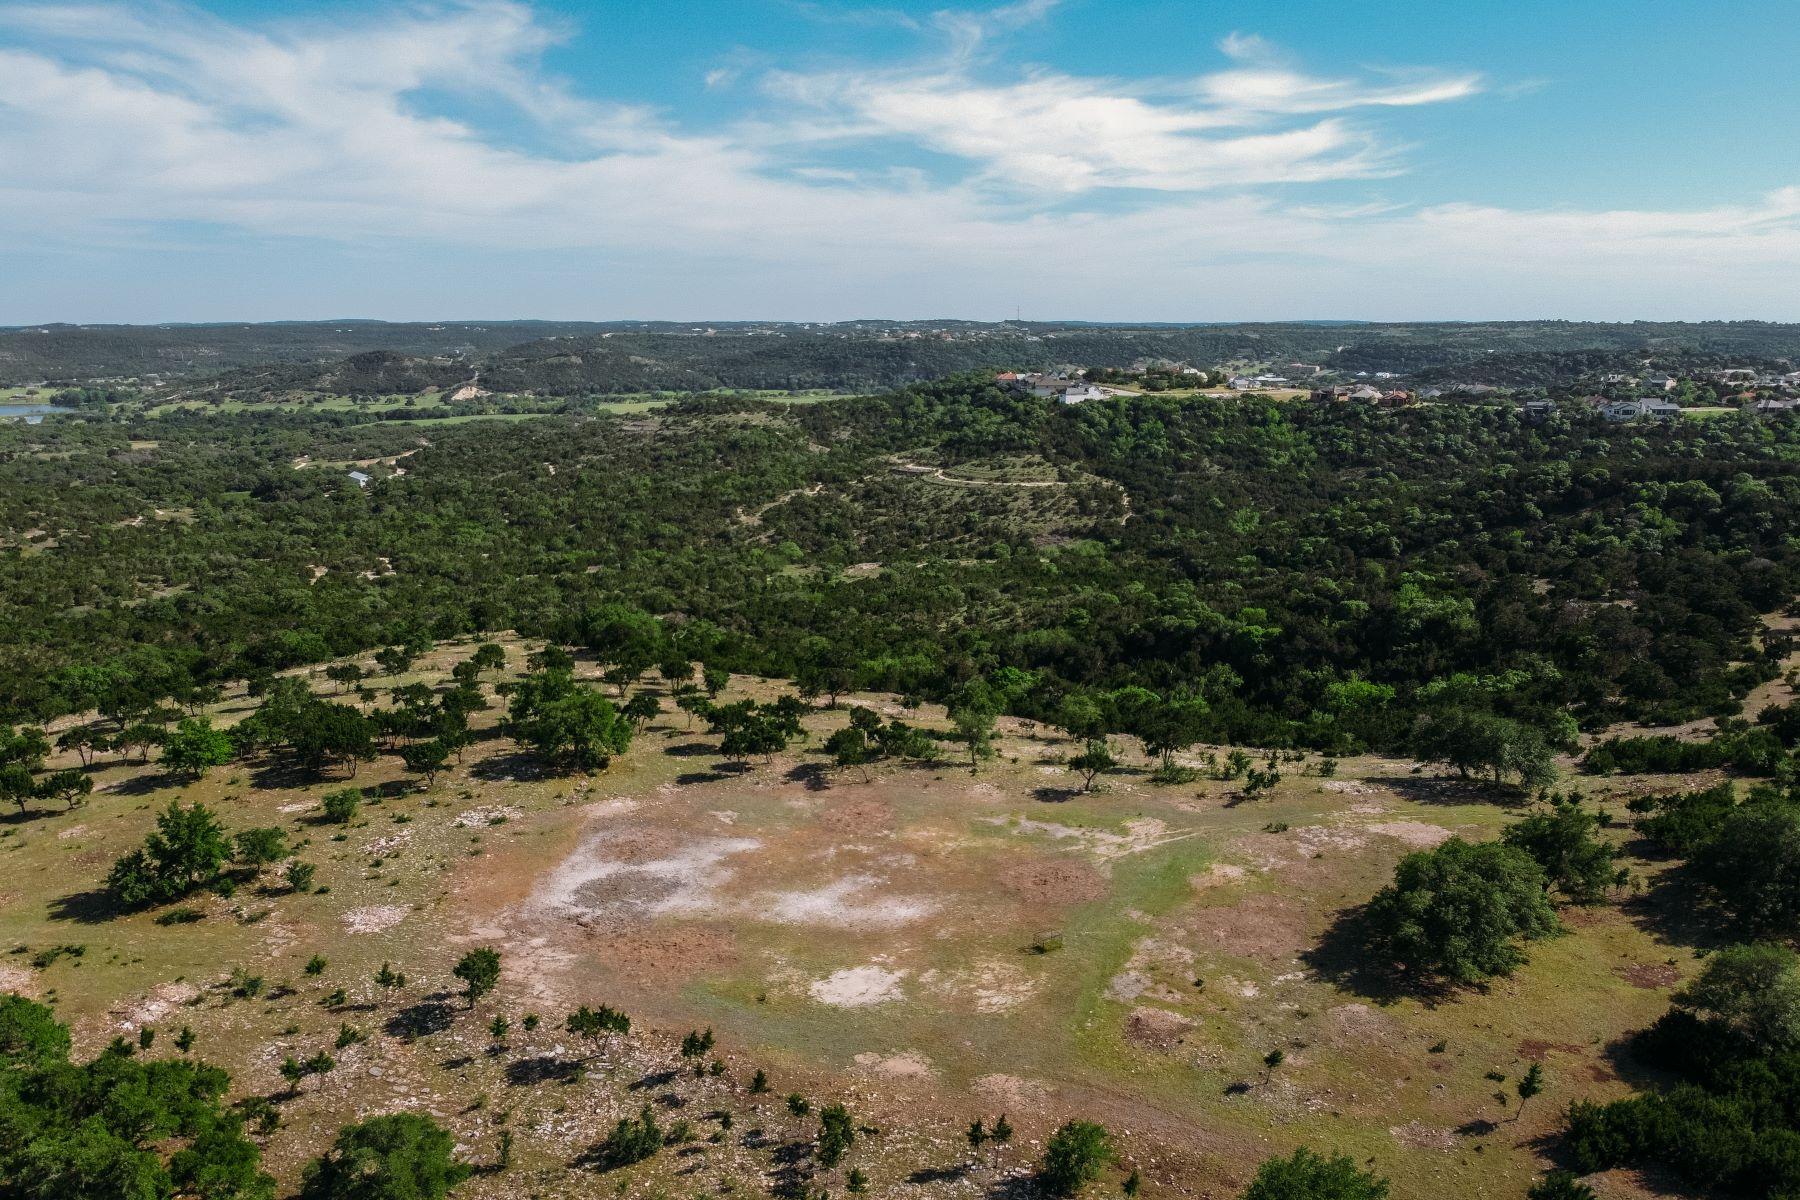 Land for Sale at 10242 Johns Road, Boerne, TX 78006 10242 Johns Road Boerne, Texas 78006 United States